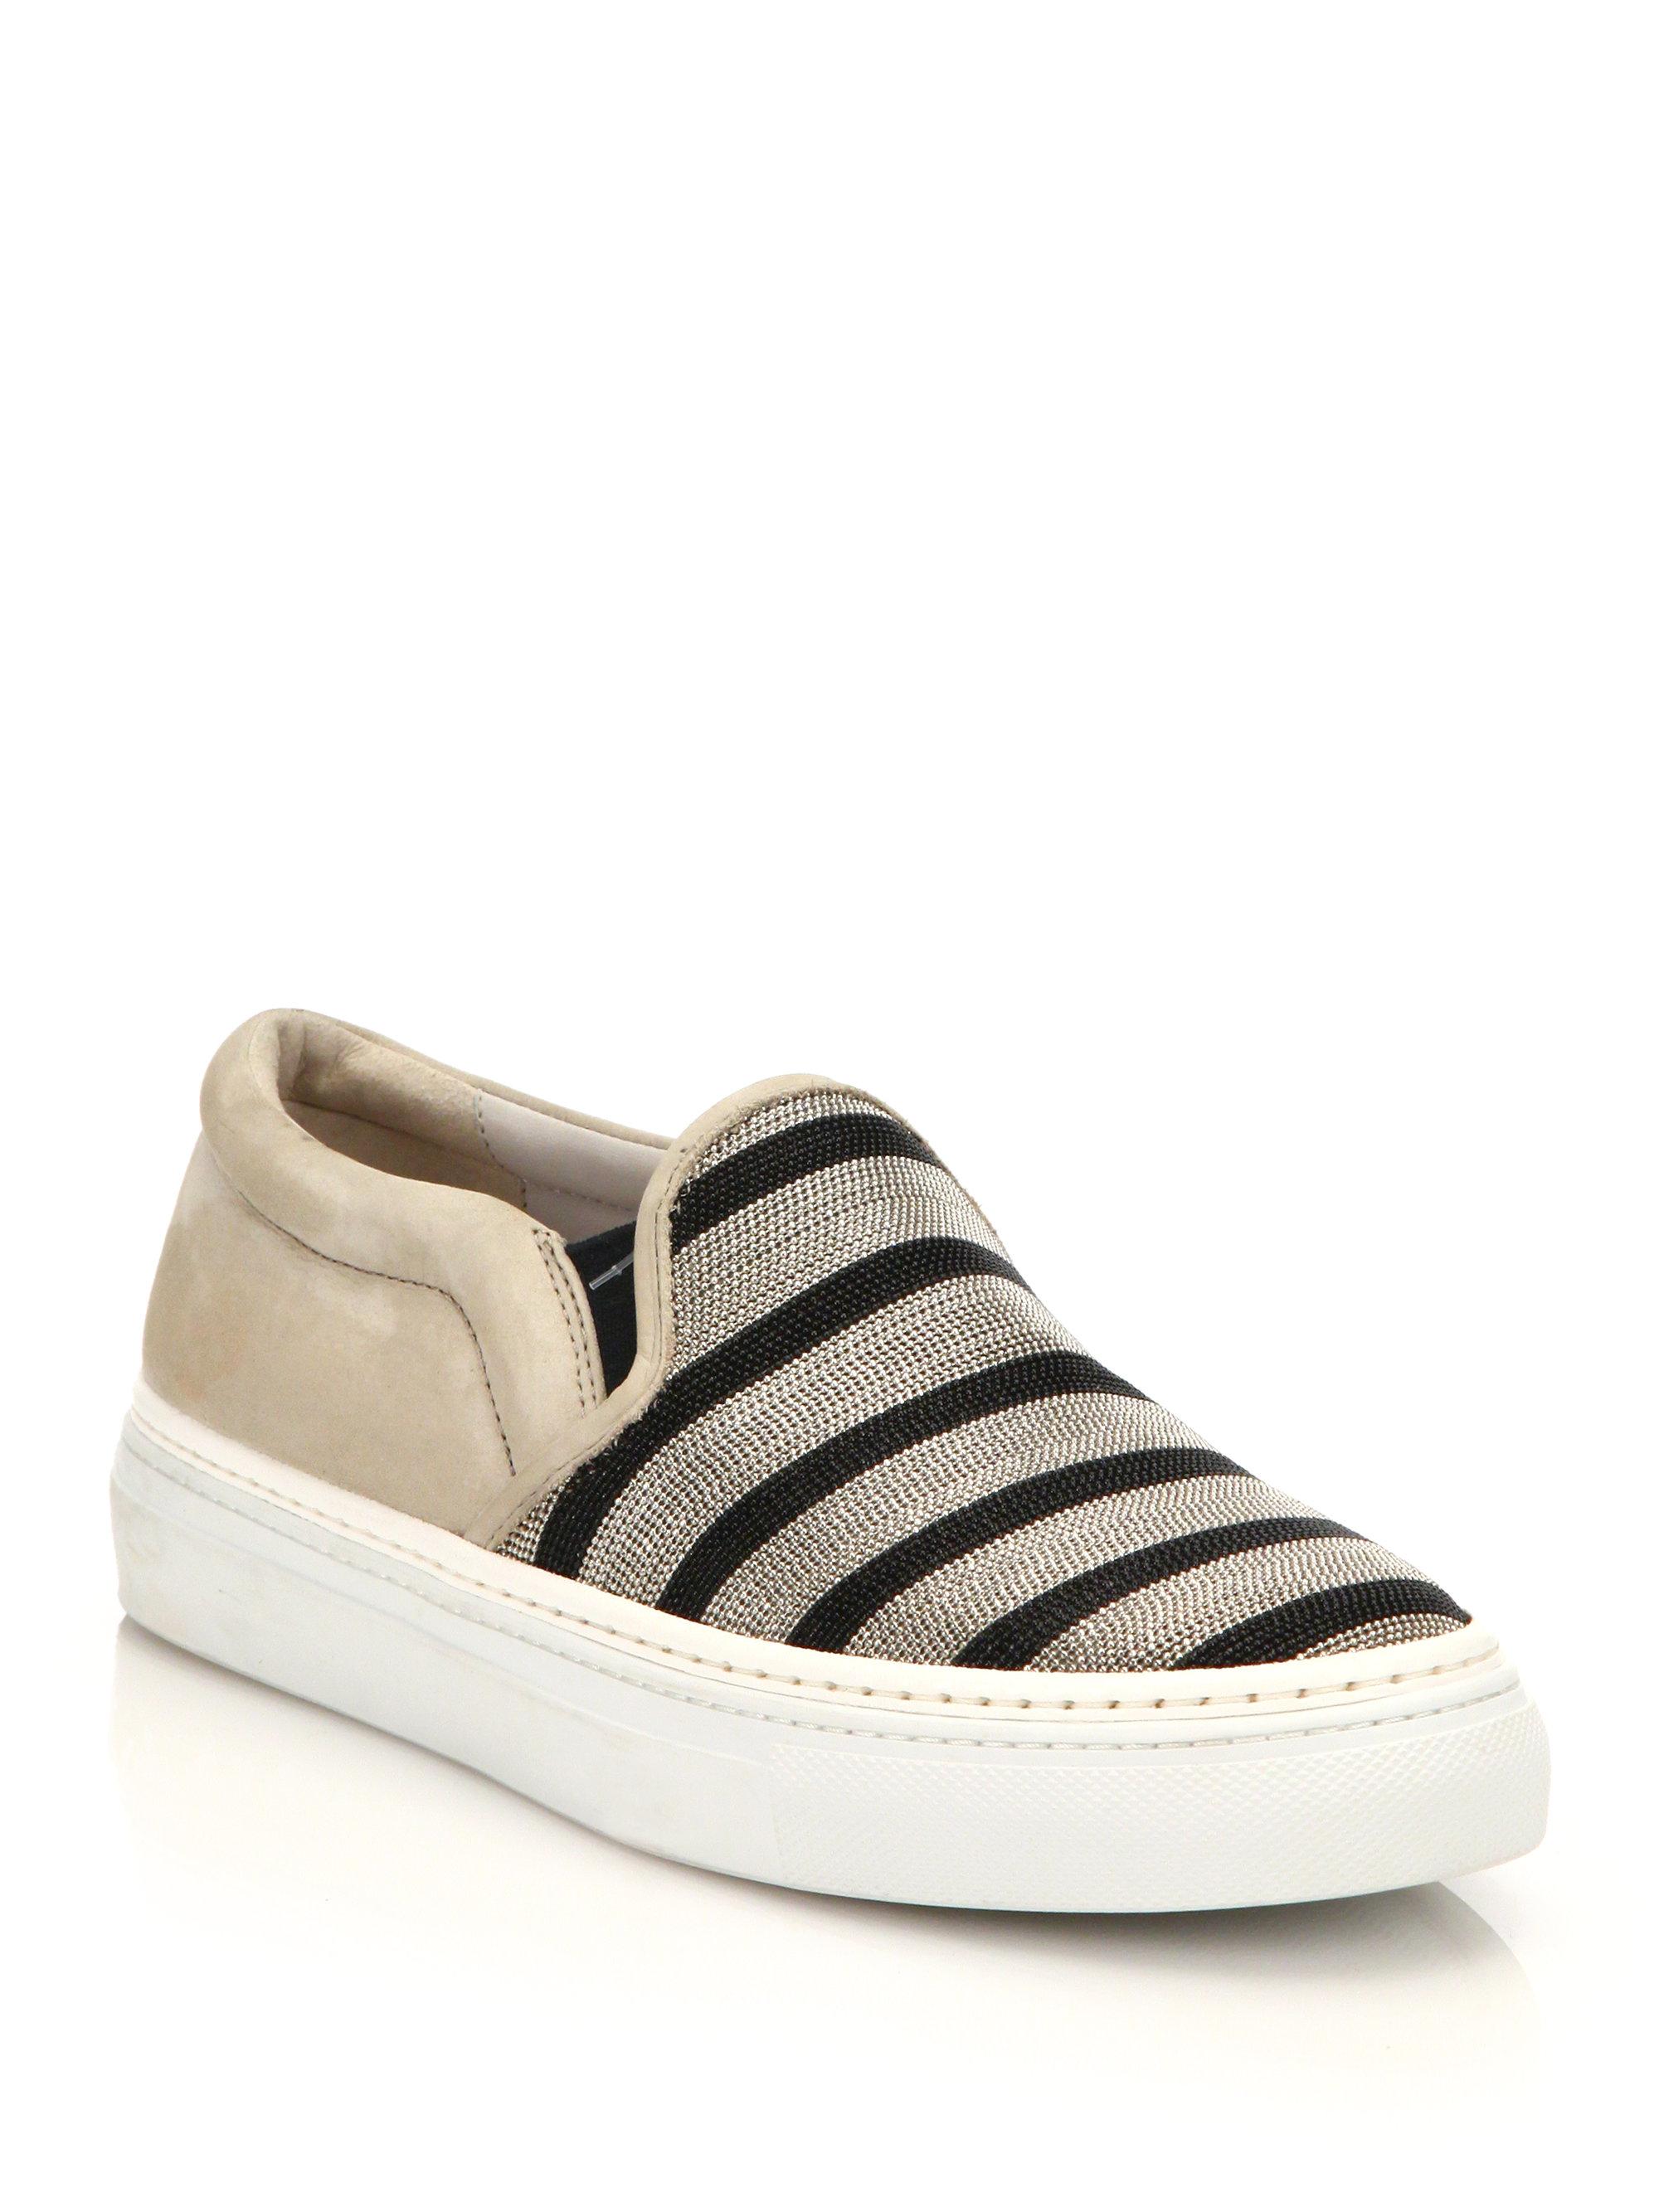 Brunello Cucinelli Monili-Embellished Slip-On Sneakers free shipping best cheap supply SqscMoe